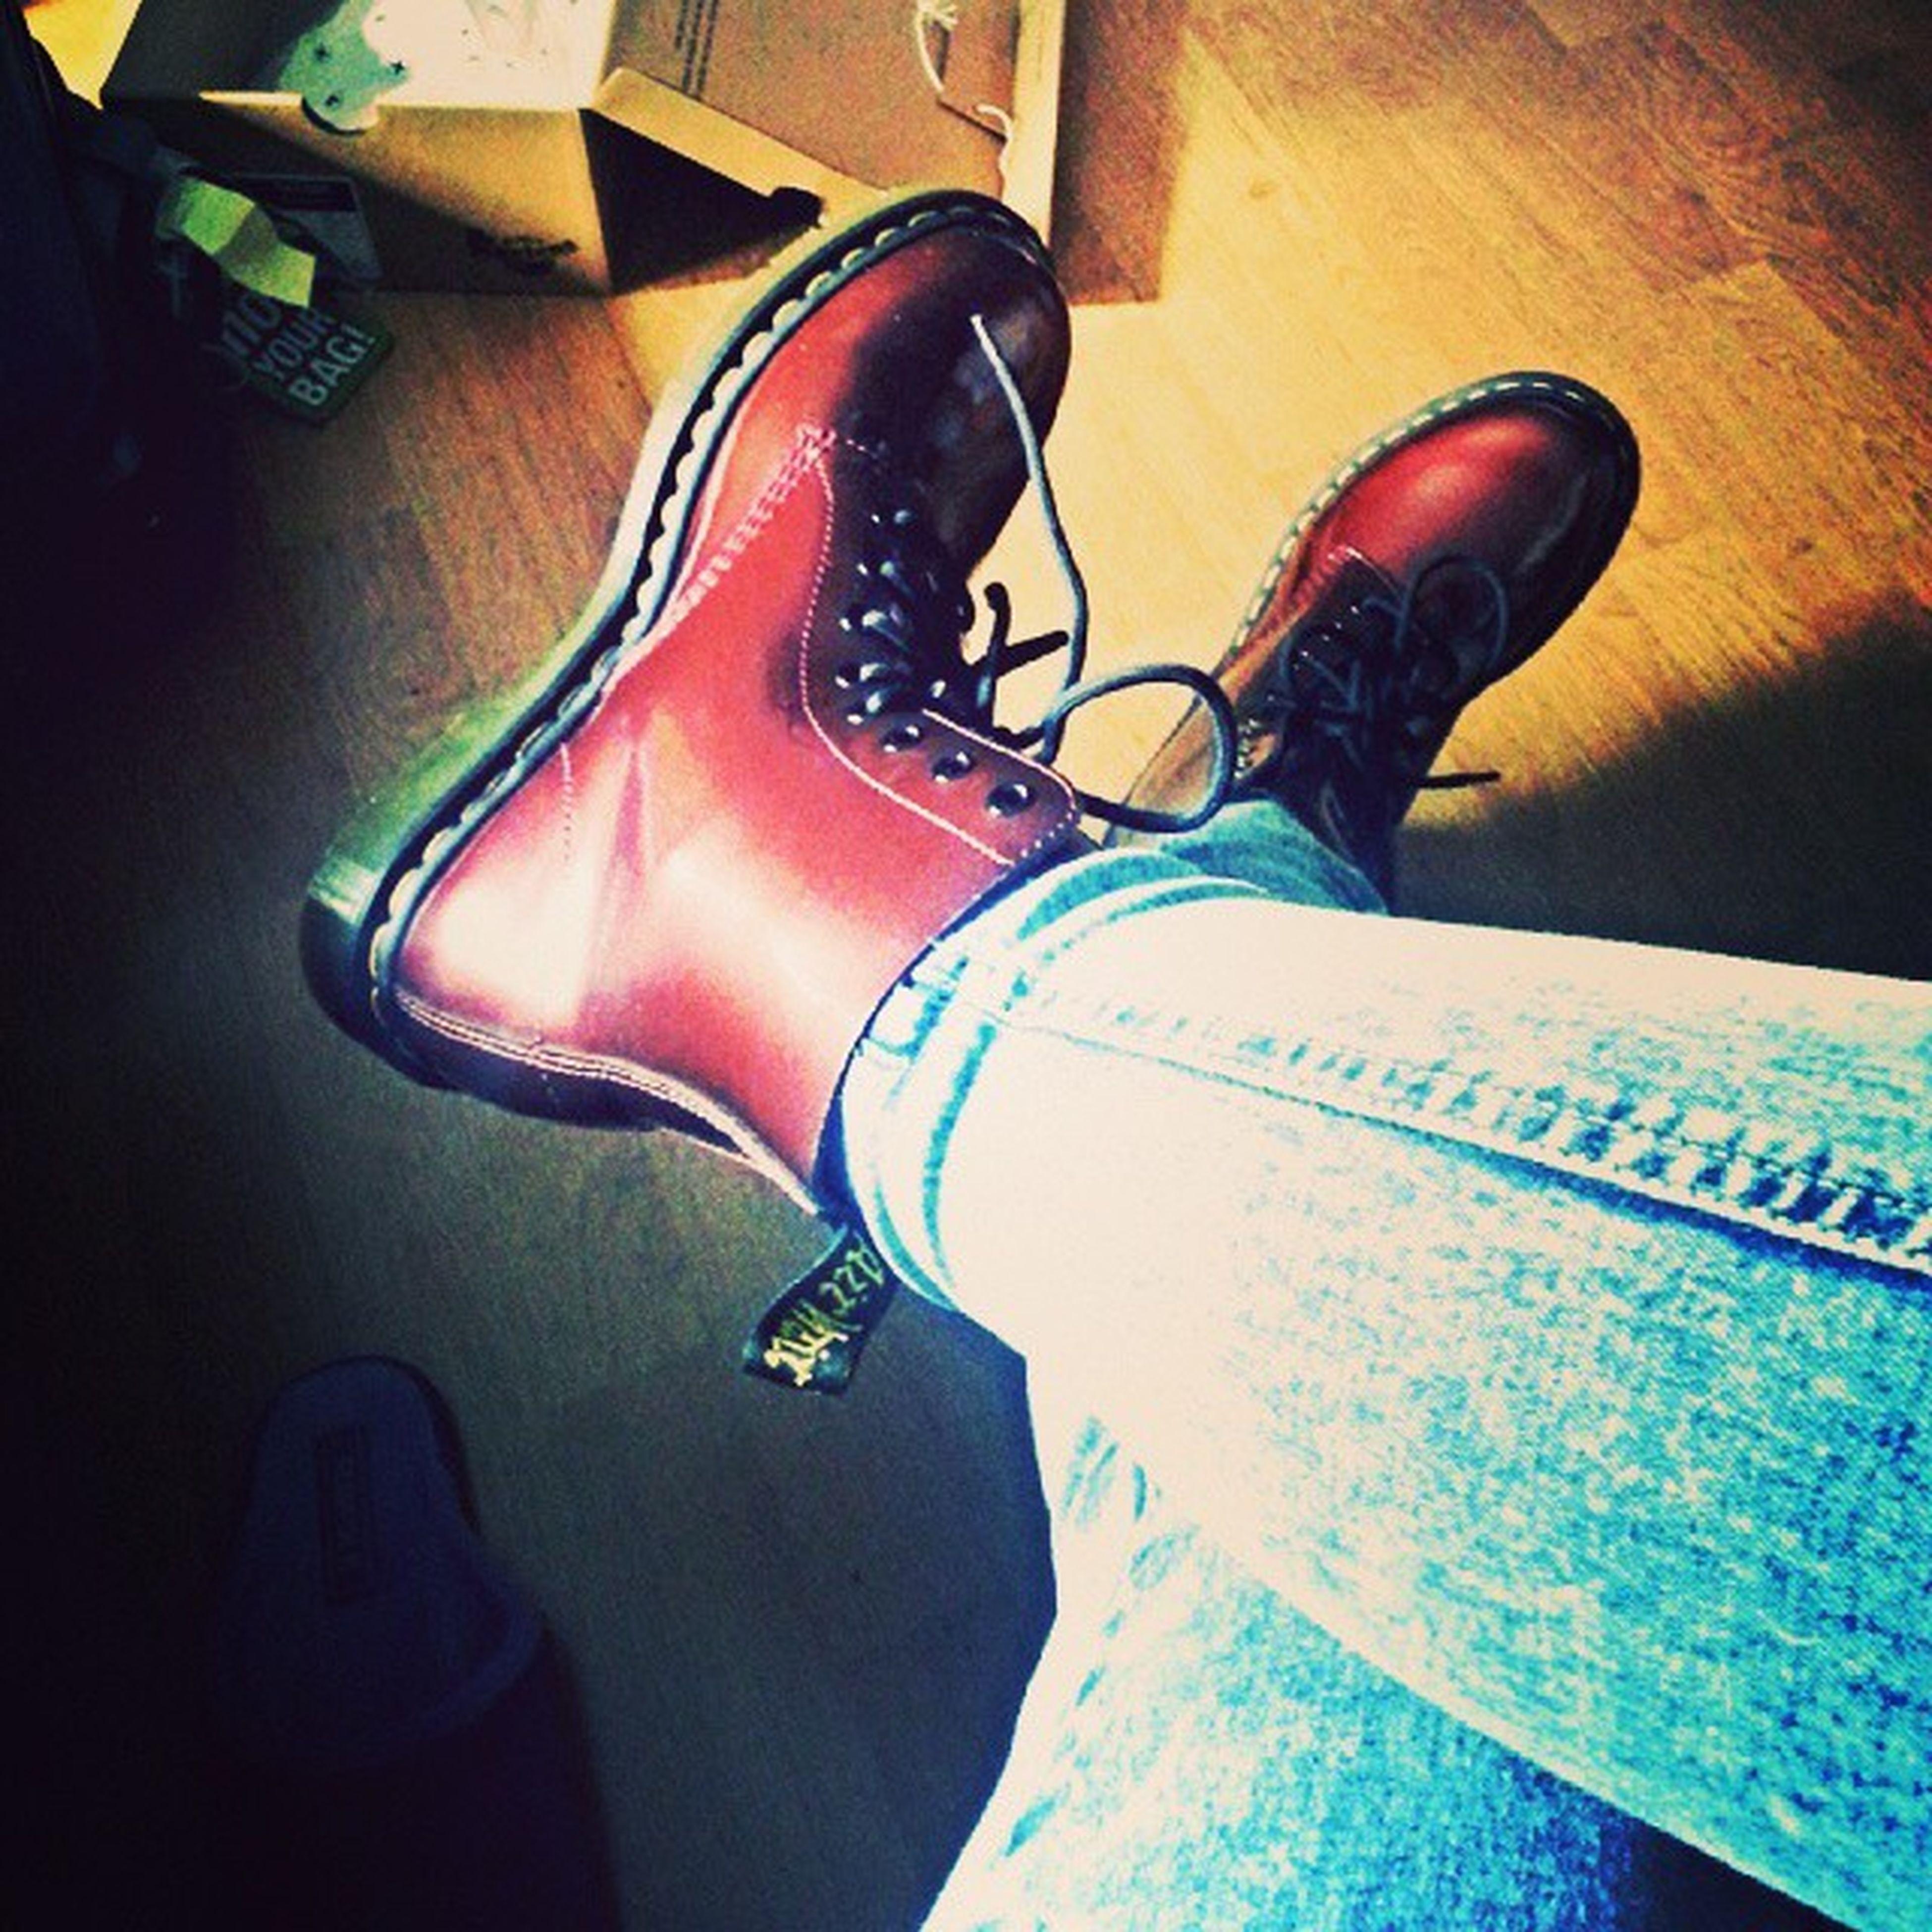 мартинсы ботинки яхууу ноги обувьвай